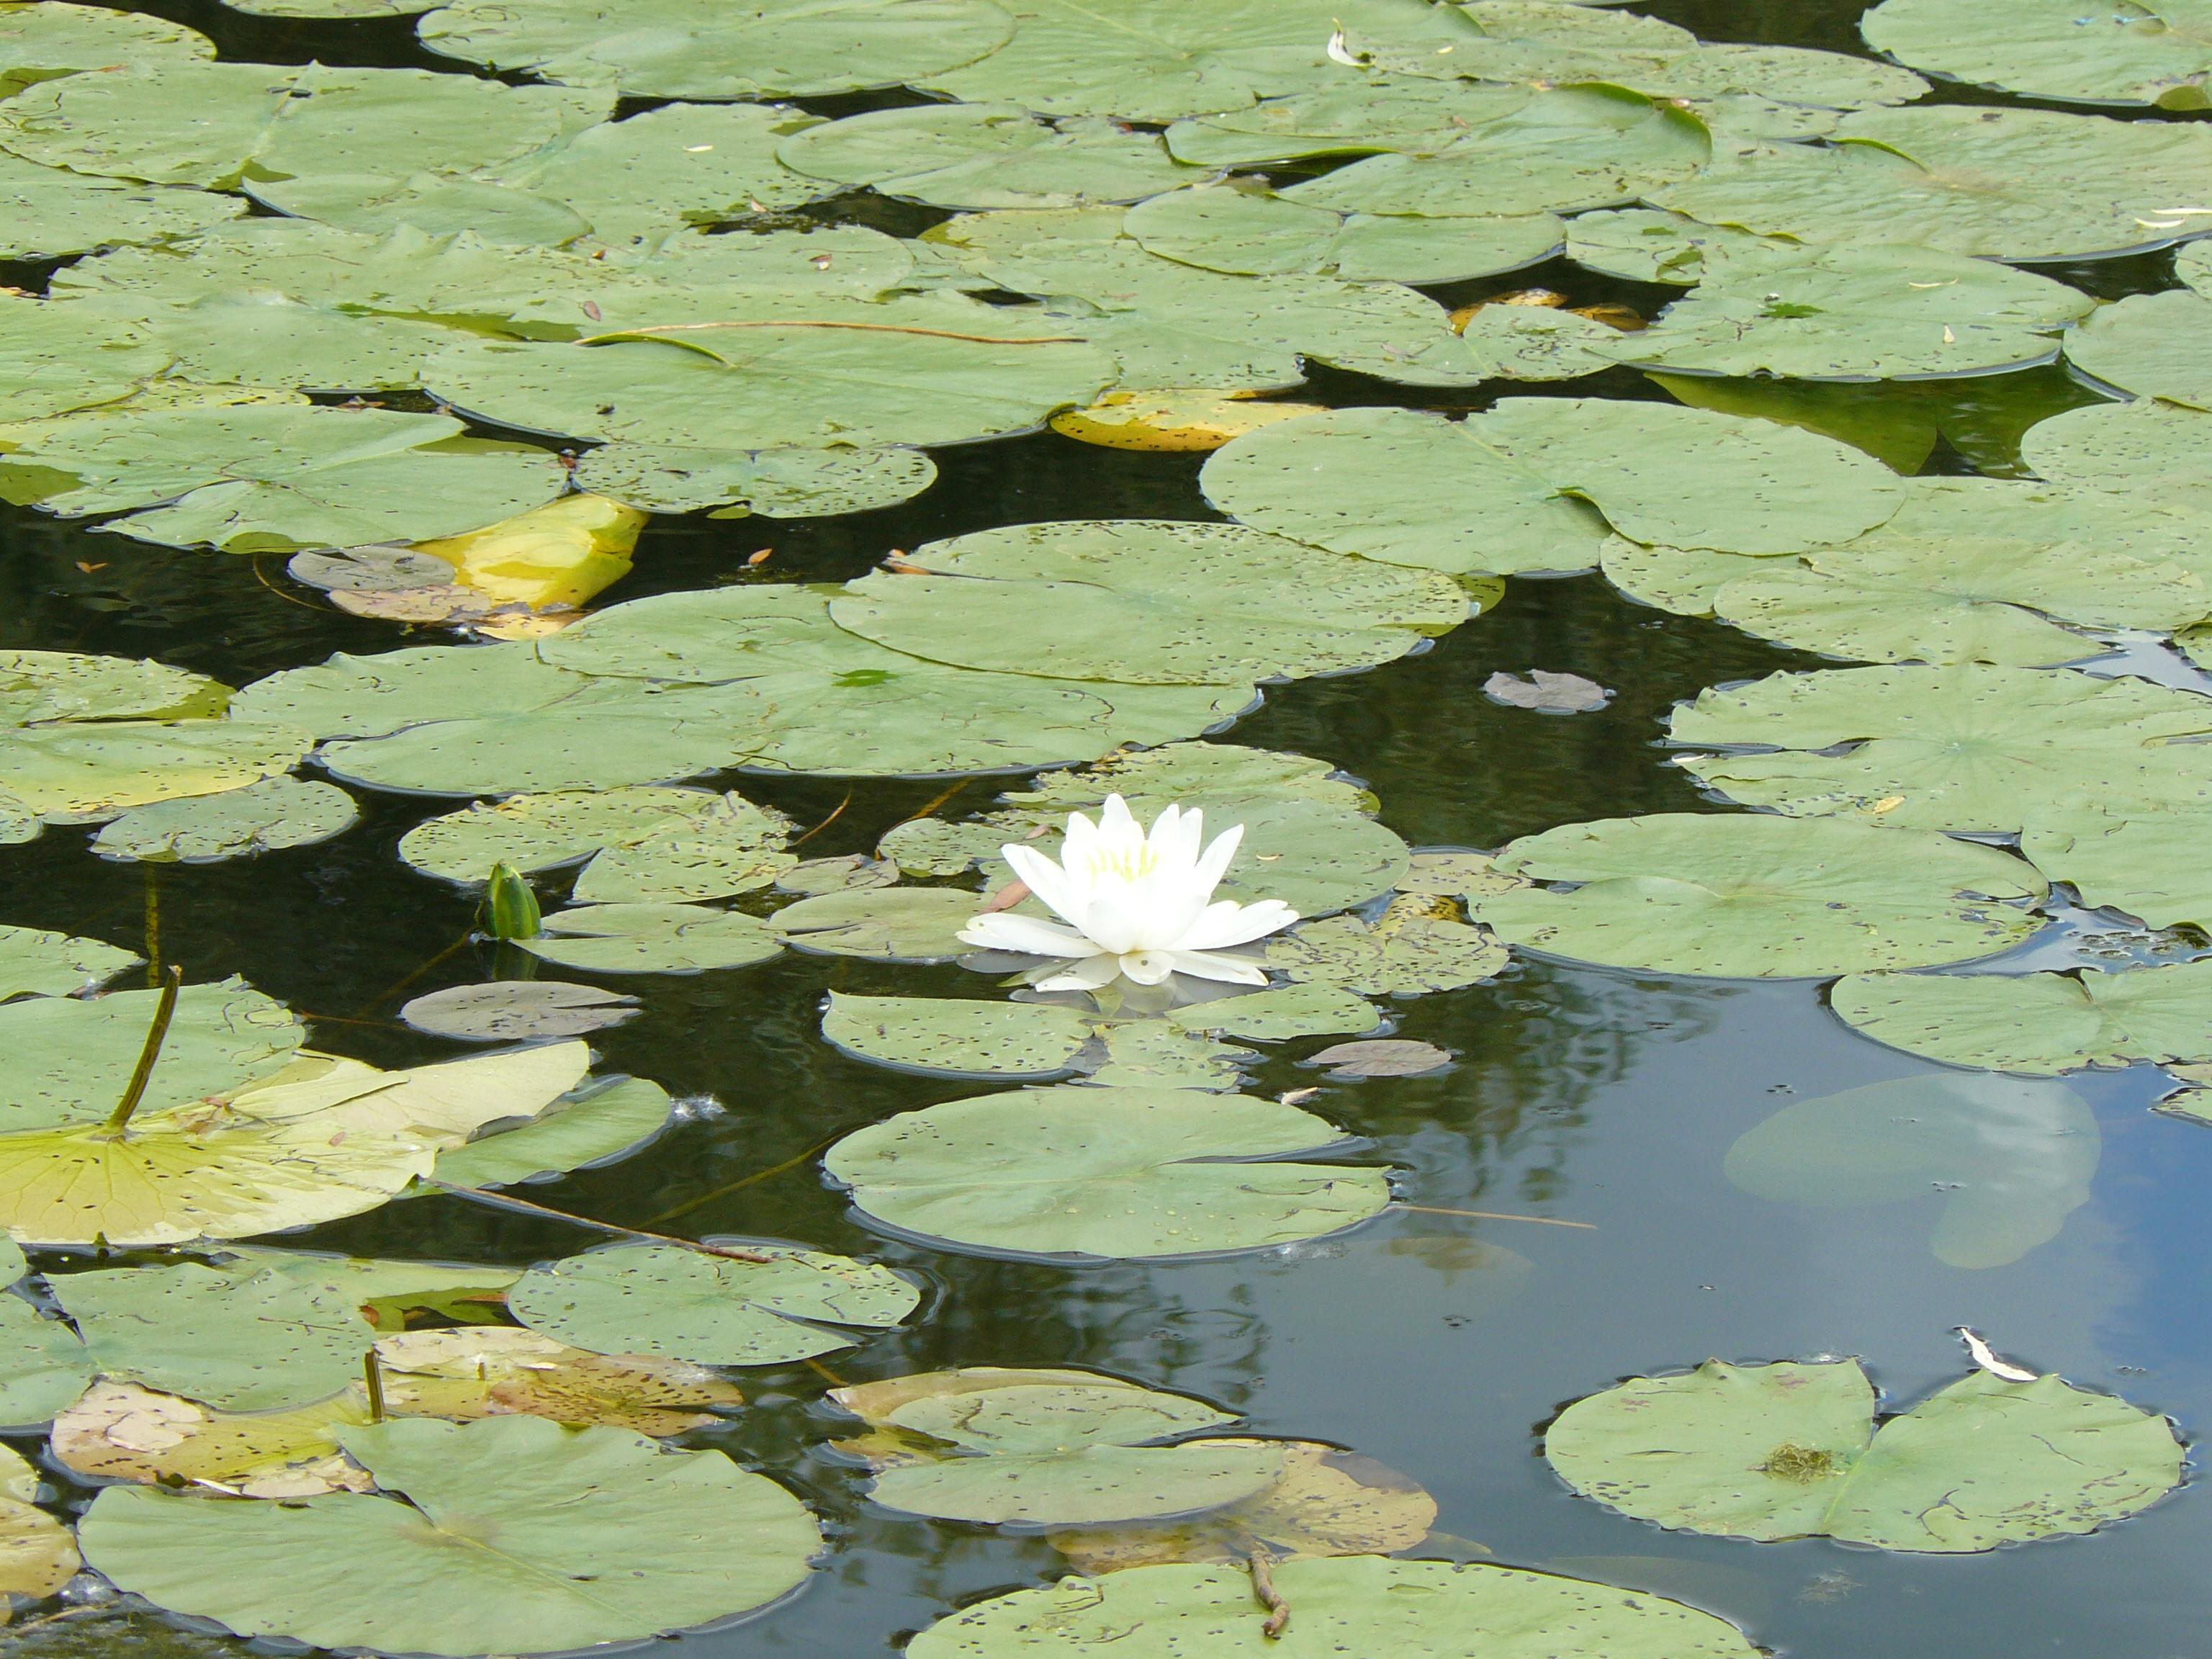 Natural beauty of hidden lake gardens photo